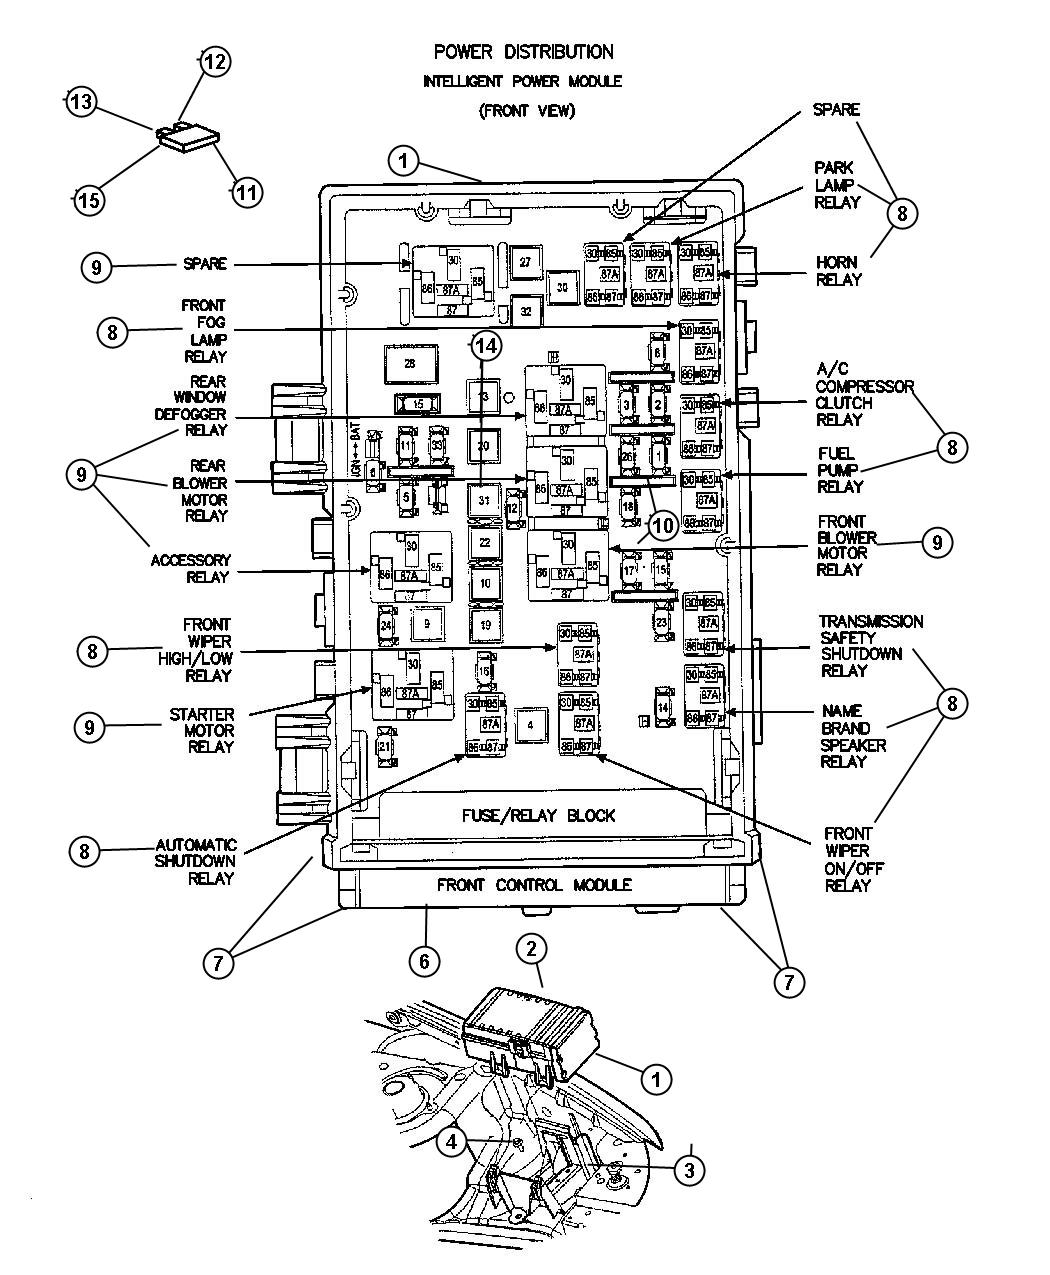 Dodge Caravan Relay. Radiator fan. Located on bumper beam